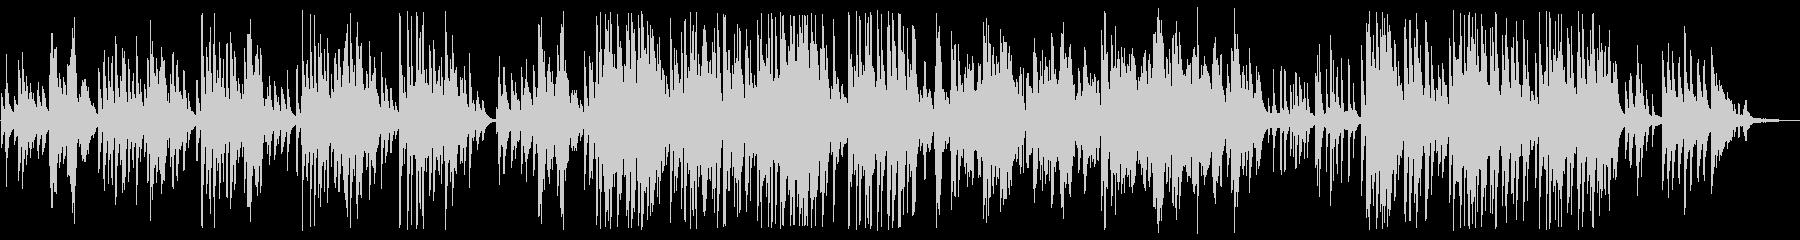 Greensleeves (piano)の未再生の波形